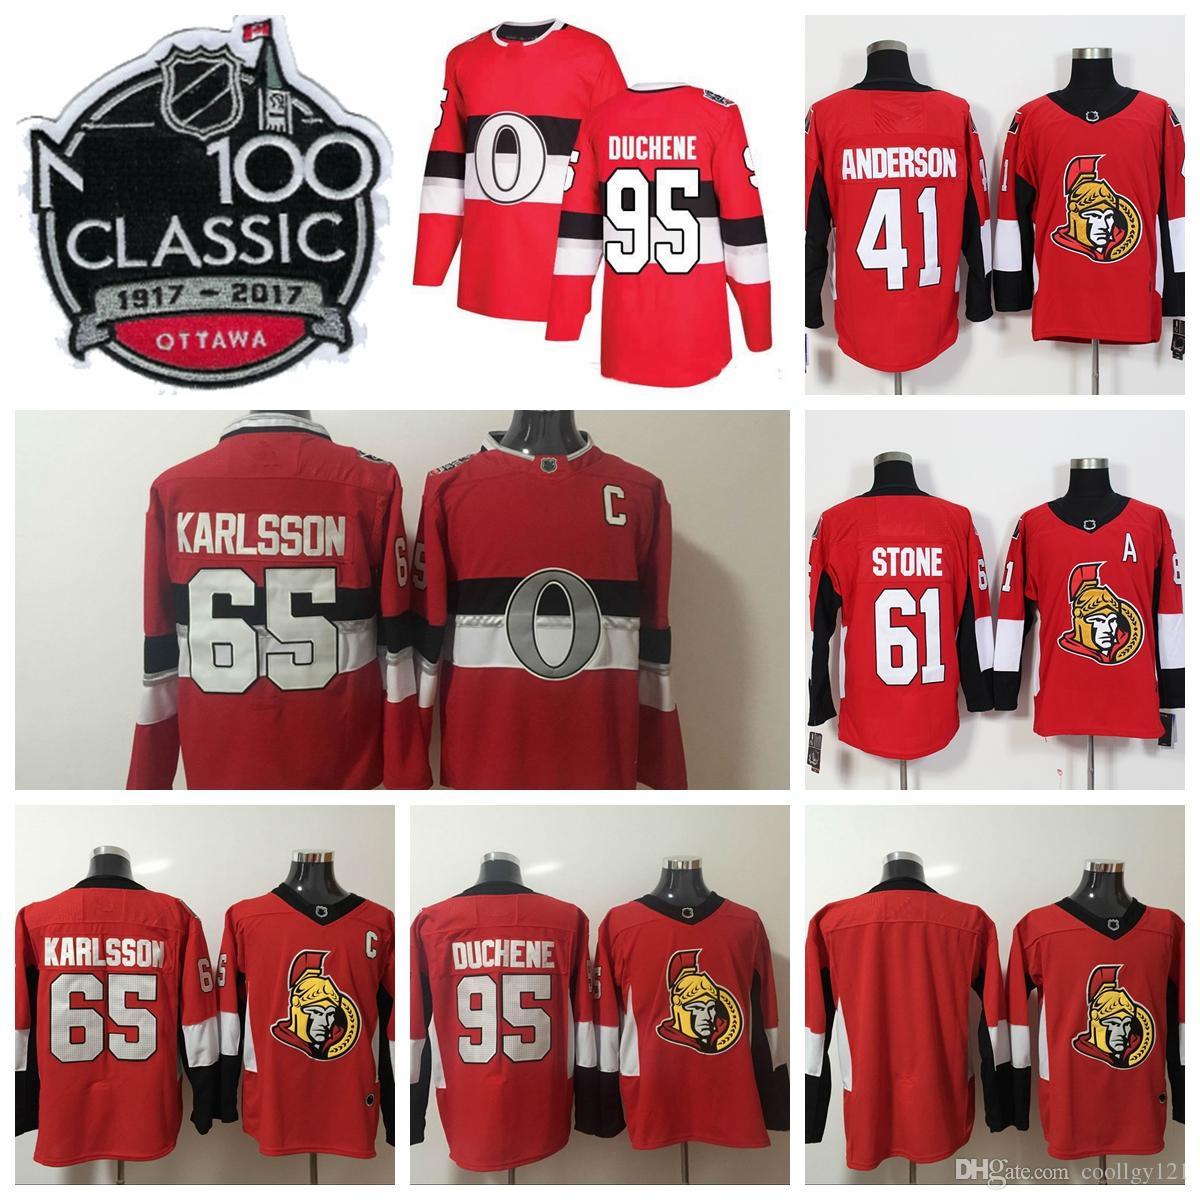 ... official store 2018 ad 100th classic ottawa senators jersey 65 erik  karlsson jersey 95 matt duchene 2fe0ad6dc